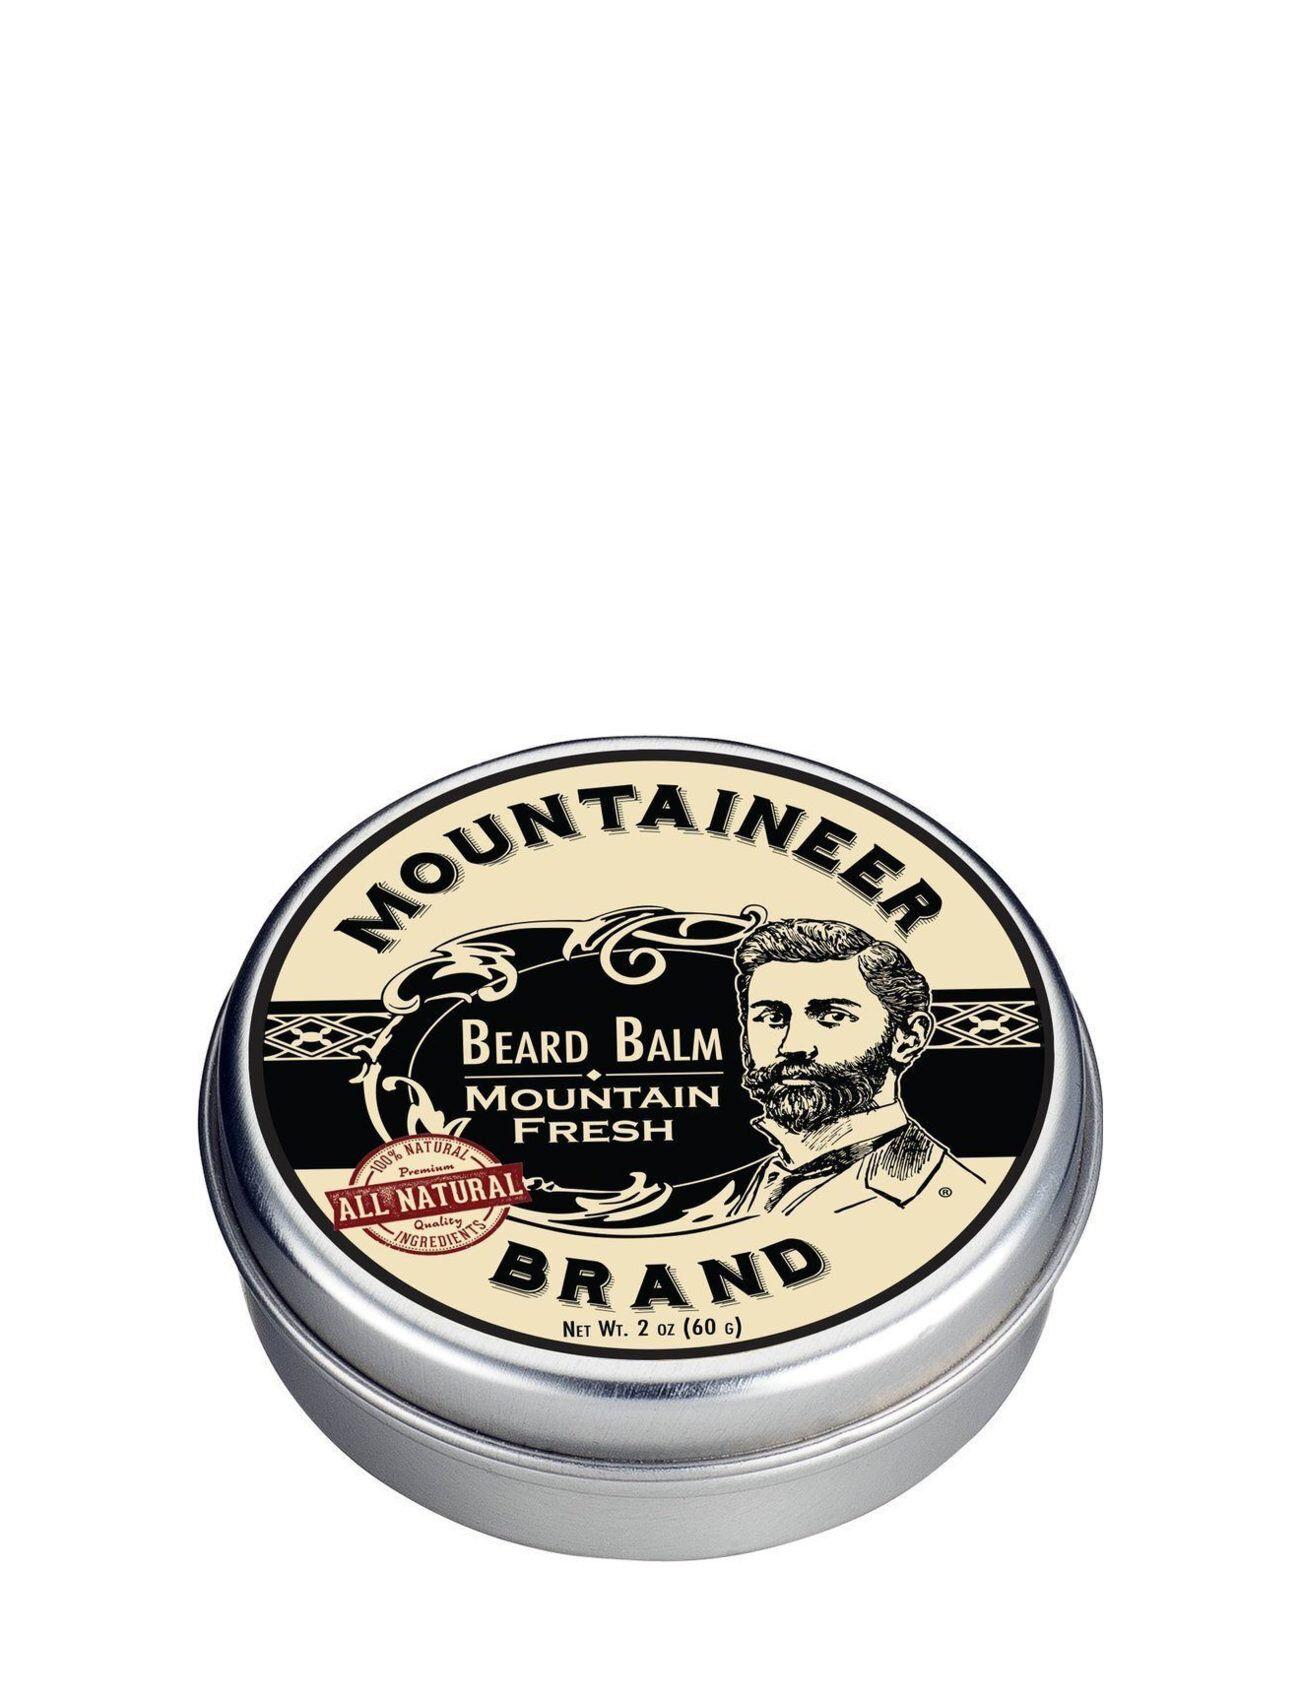 Mountaineer Brand Magic Coal Beard Balm